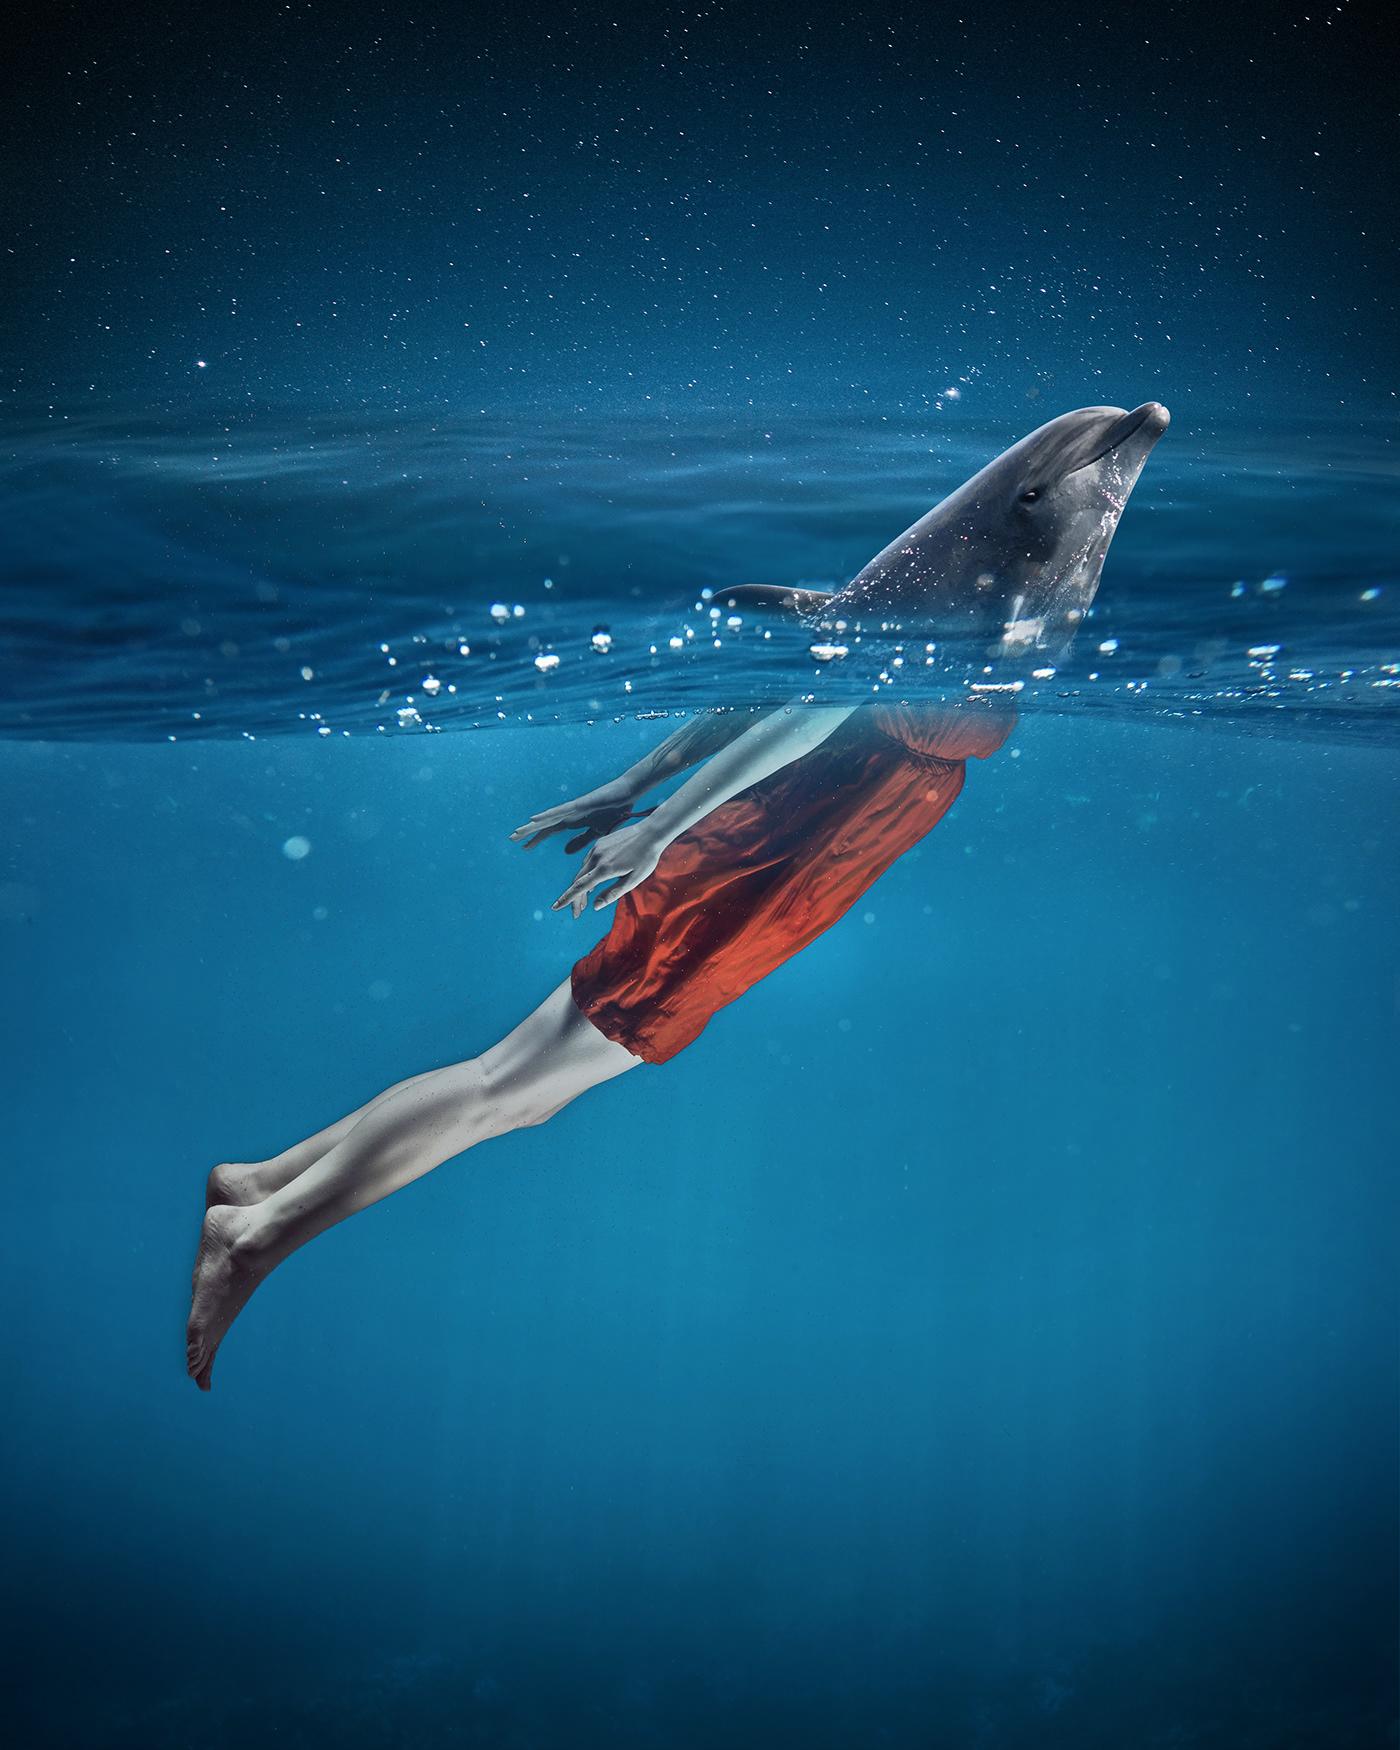 postproduction manipulation composition photoshop adobephotoshop sea retouching  postpro dolphin unsplash